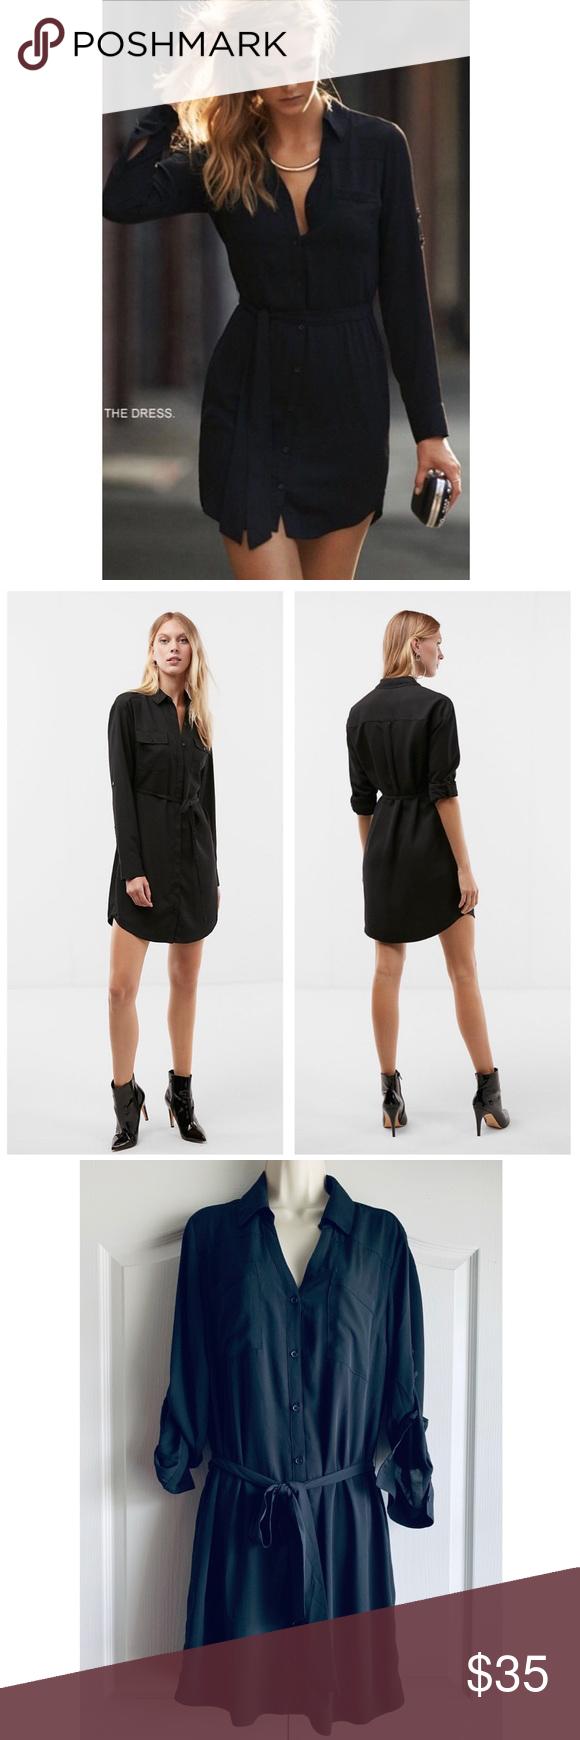 a41420ee4e66 Express Black Long Sleeve Portofino Shirt Dress Excellent condition - no  flaws. Details  long